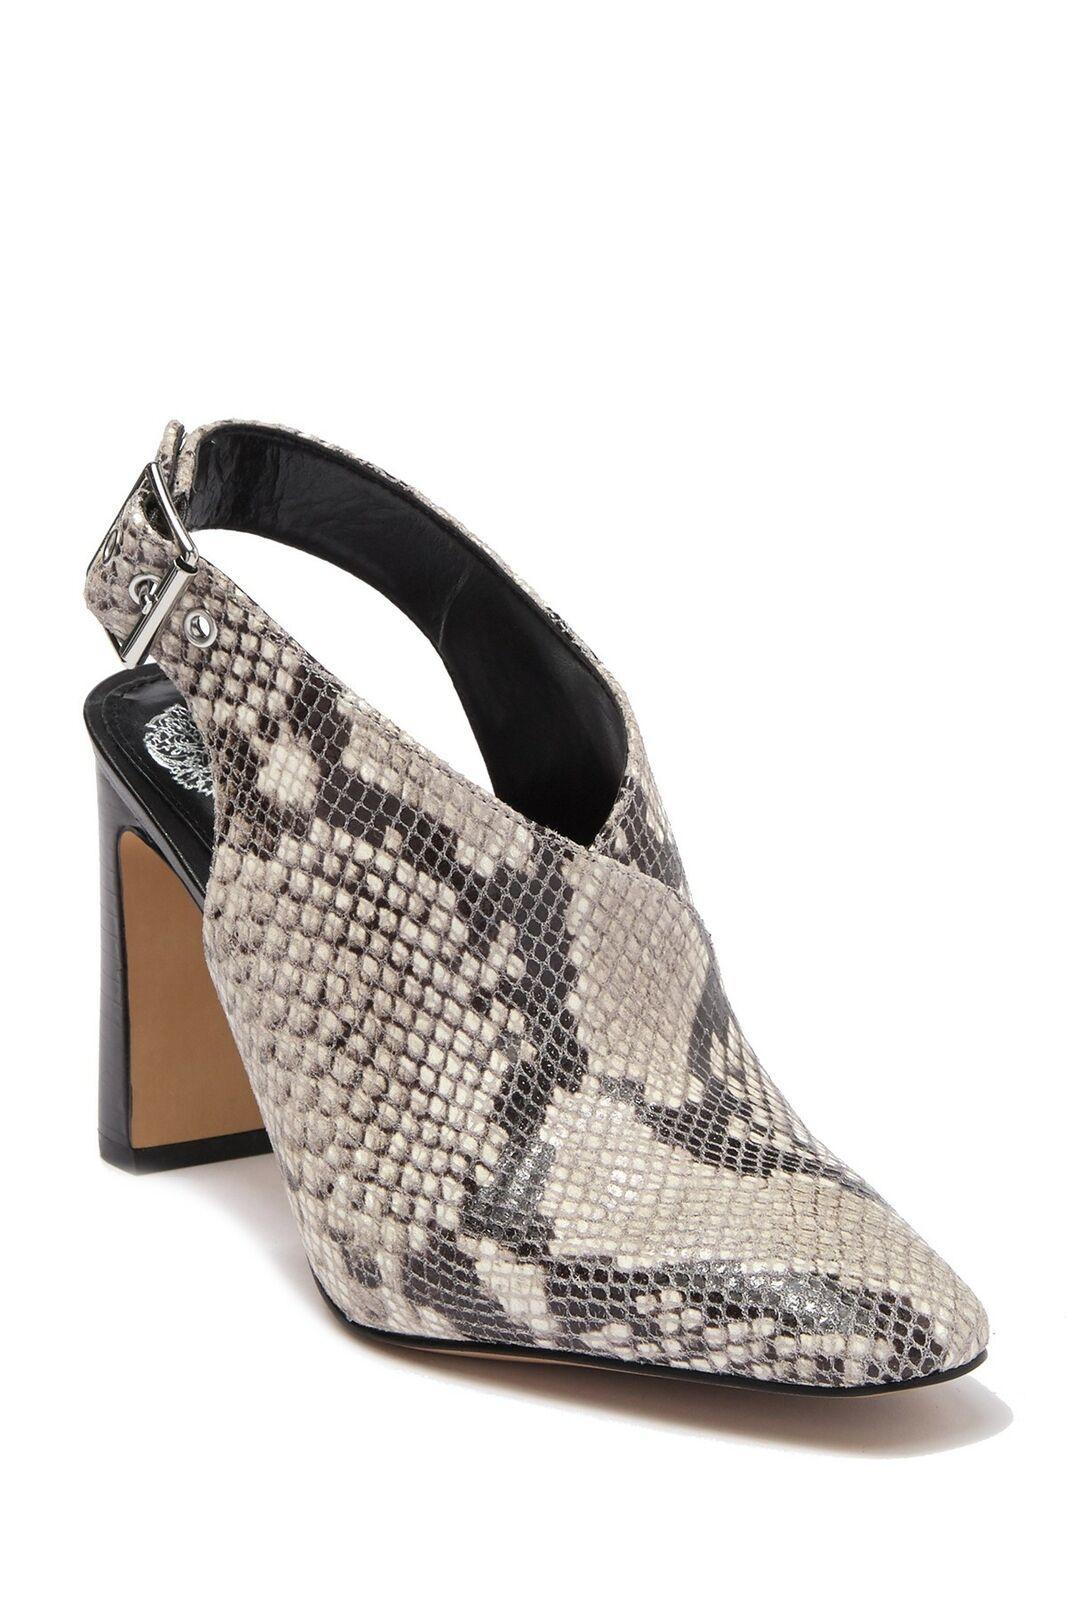 Vince Camuto Women Slingback Heels Saleesha Size US 4.5M Oxford Beige Snake - $53.98